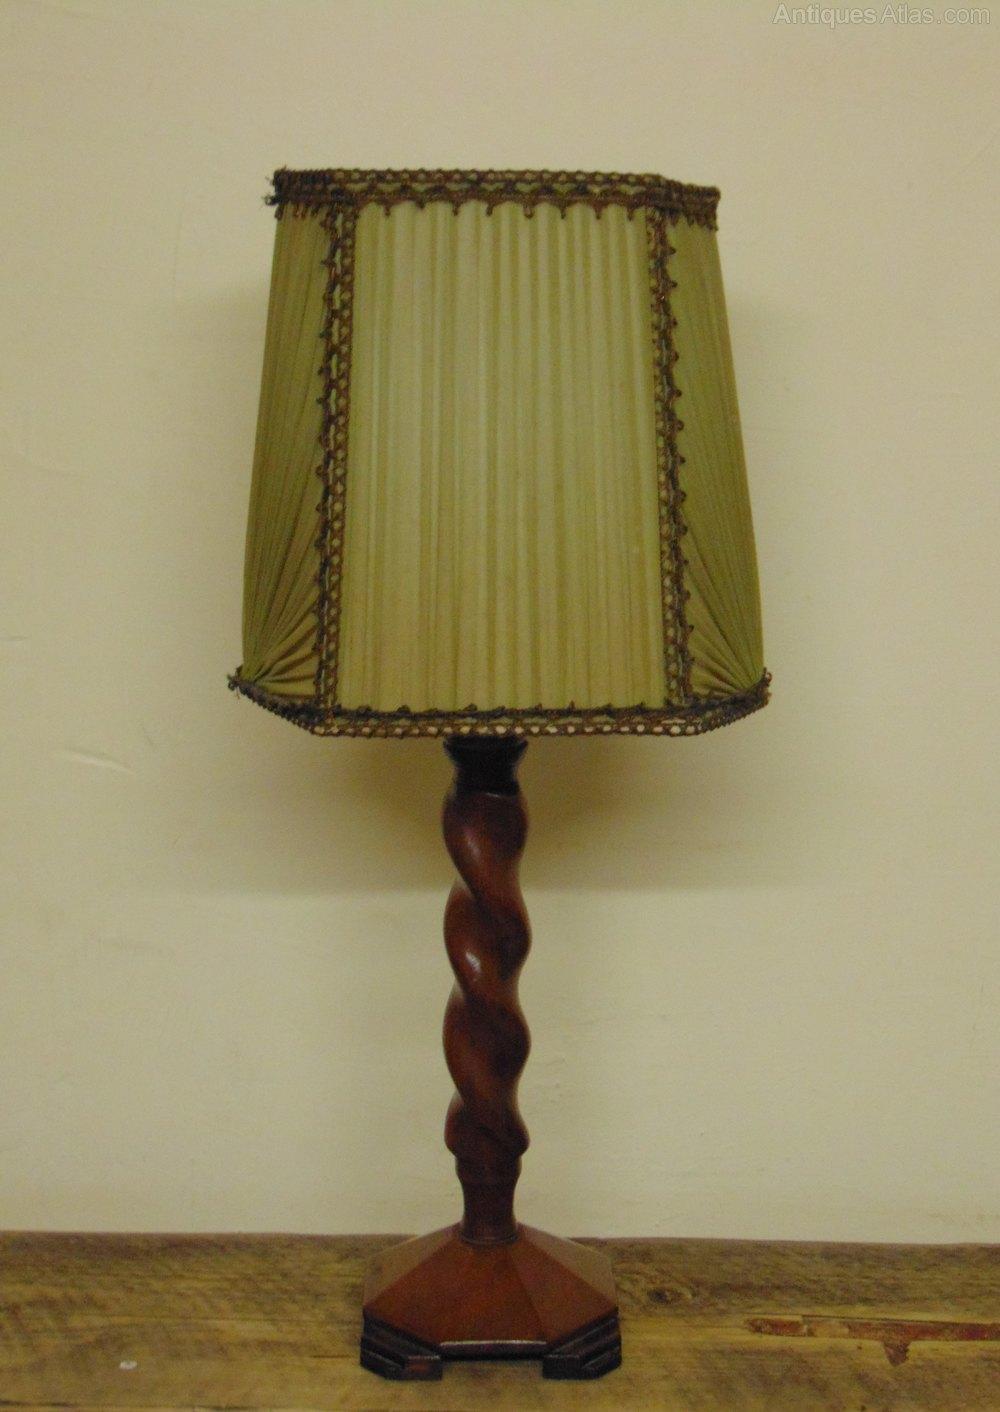 Antiques atlas art deco barley twist table lamp art deco barley twist table lamp aloadofball Images